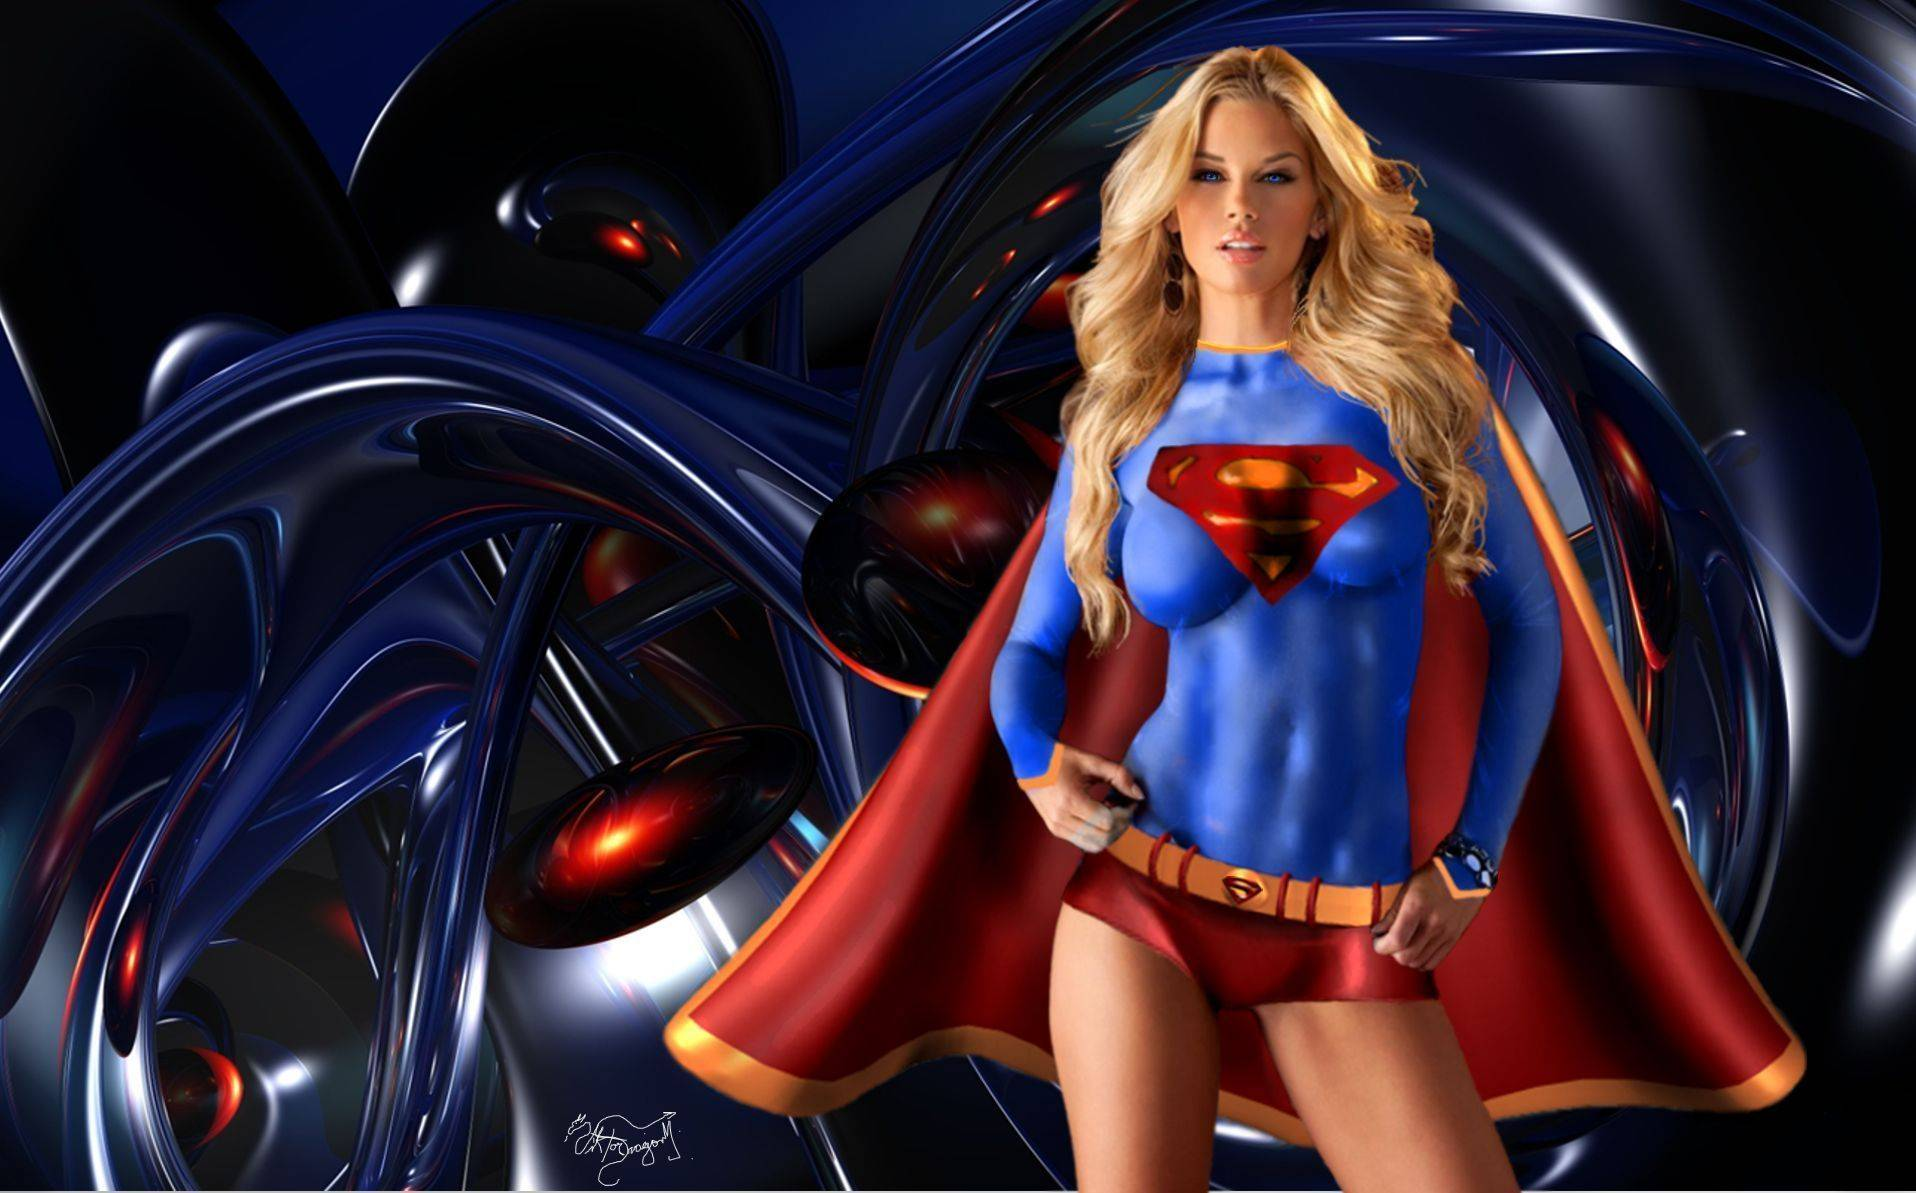 Super Girl Wallpaper – Free wallpaper download